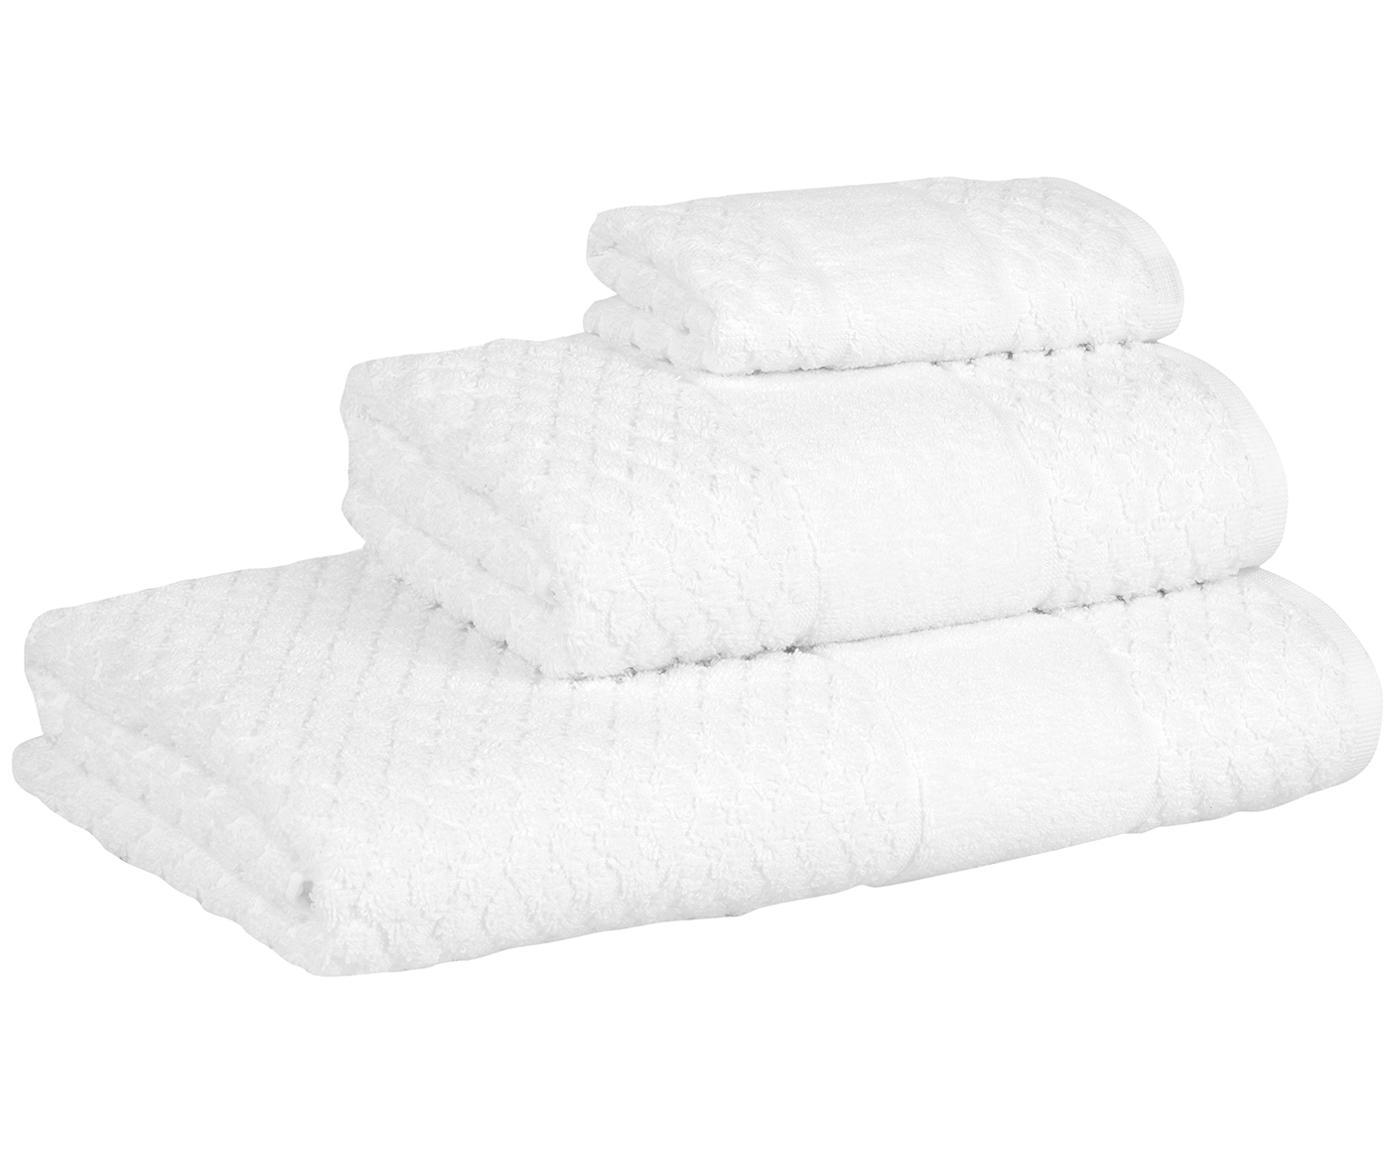 Set de toallas texturizada Katharina, 3pzas., Blanco, Tamaños diferentes